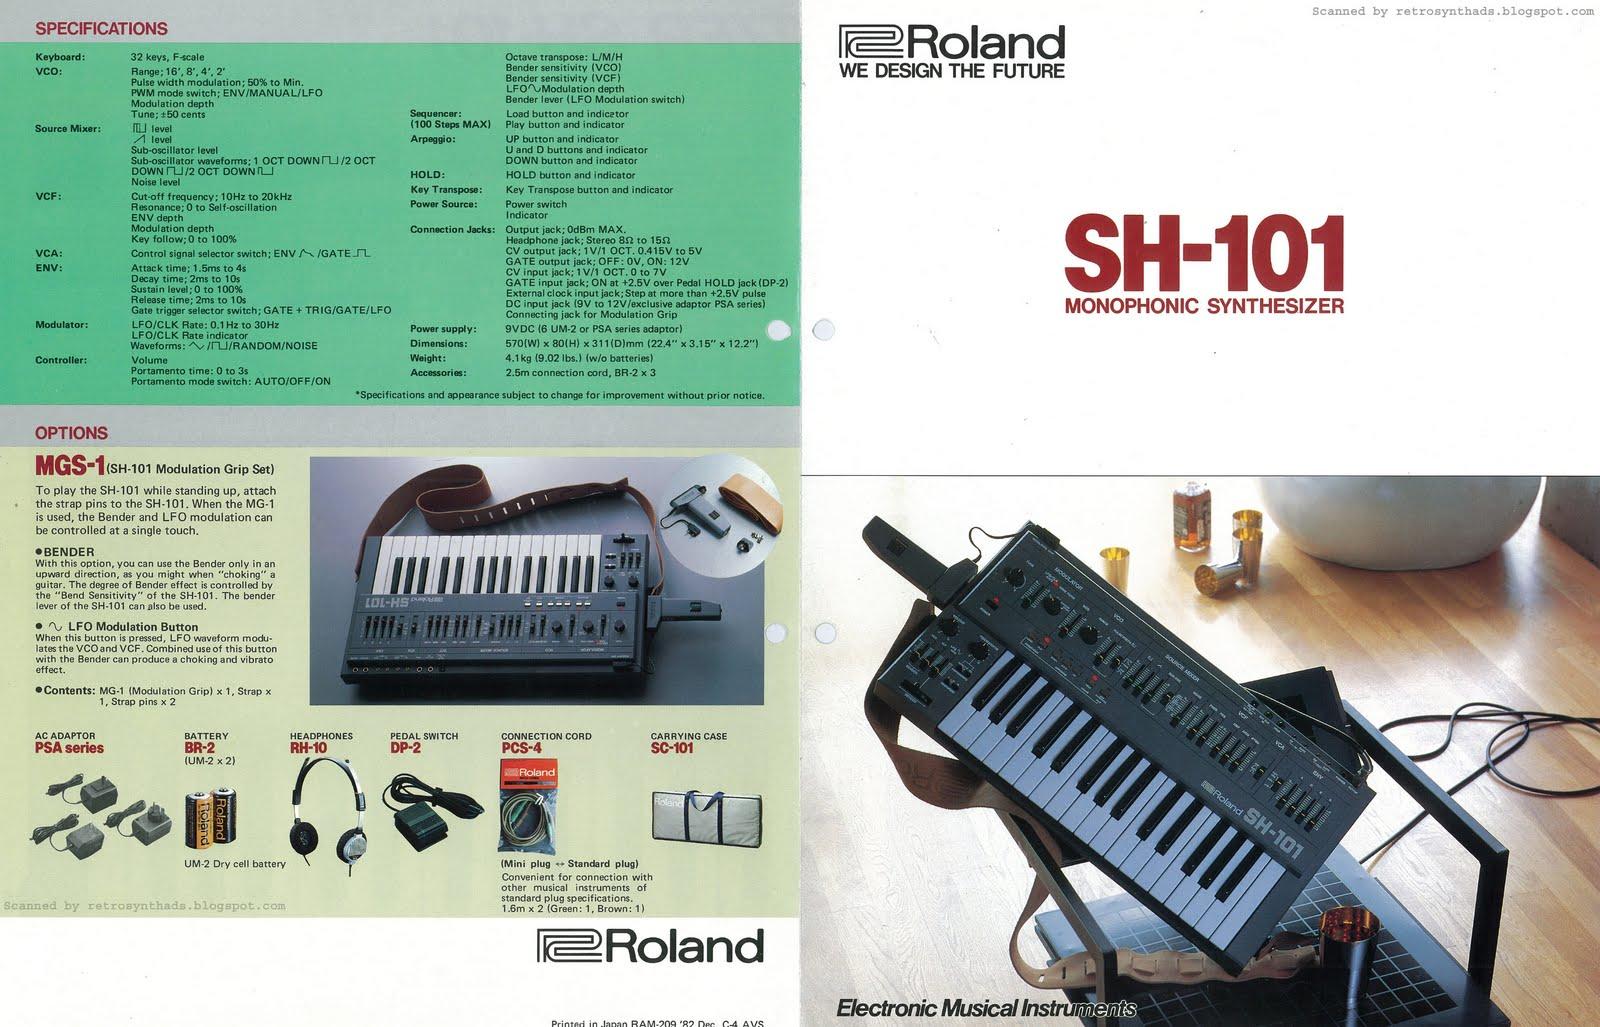 retrosynthads.blogspot.ca/2010/09/roland-sh-101-brochure-1982.html